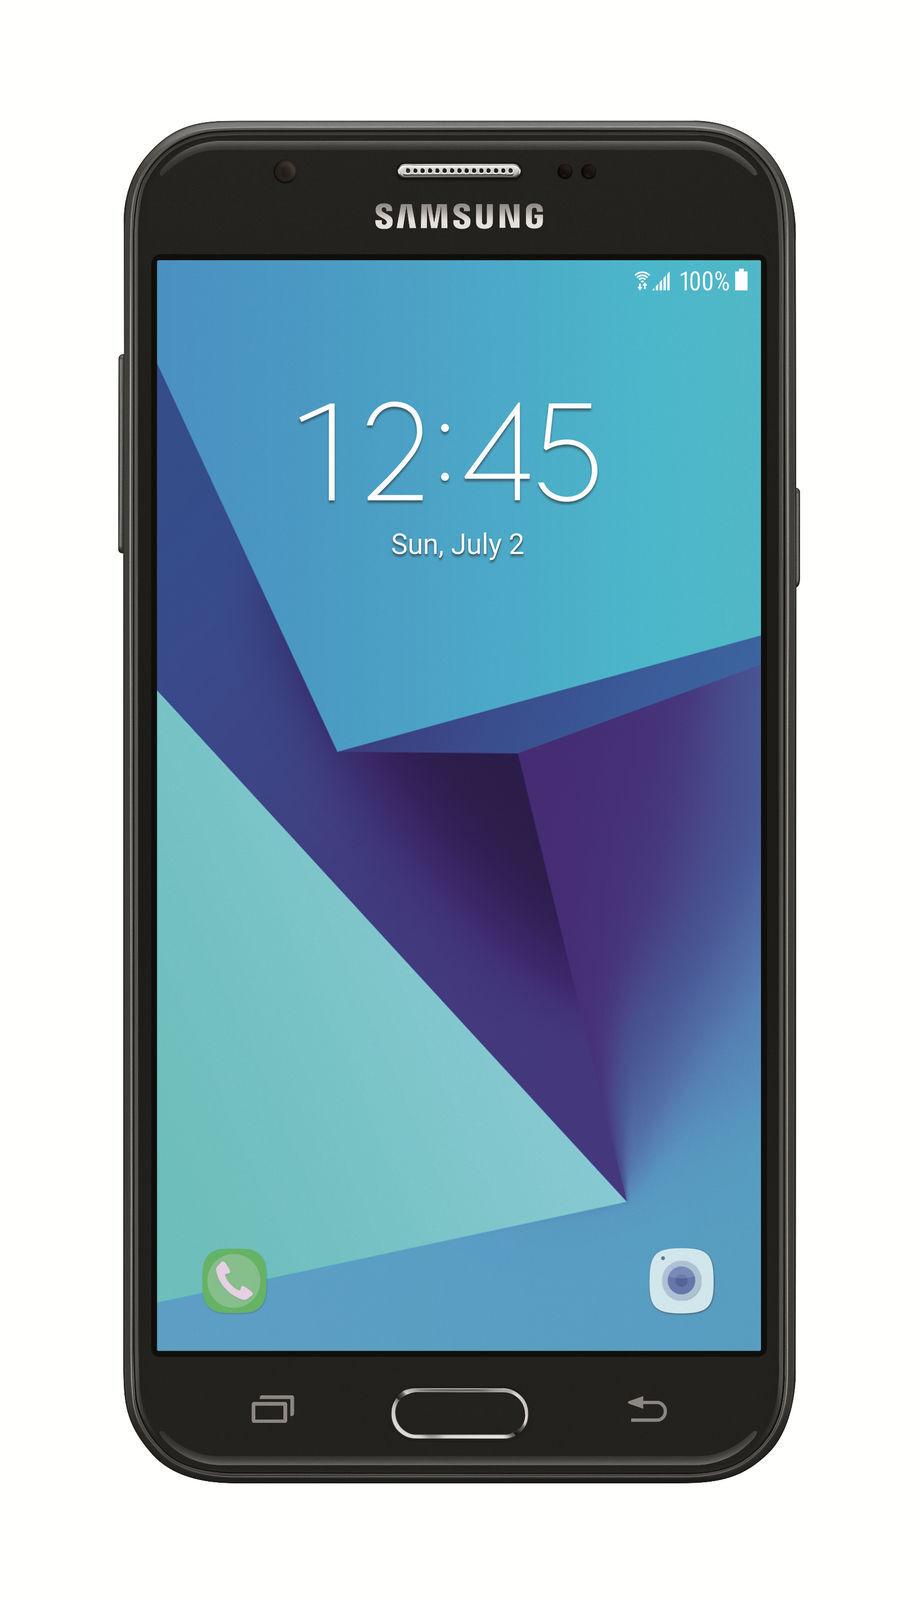 Samsung Galaxy J7 SM-J727 - 16GB - Black (Unlocked) Smartphone - (2017)